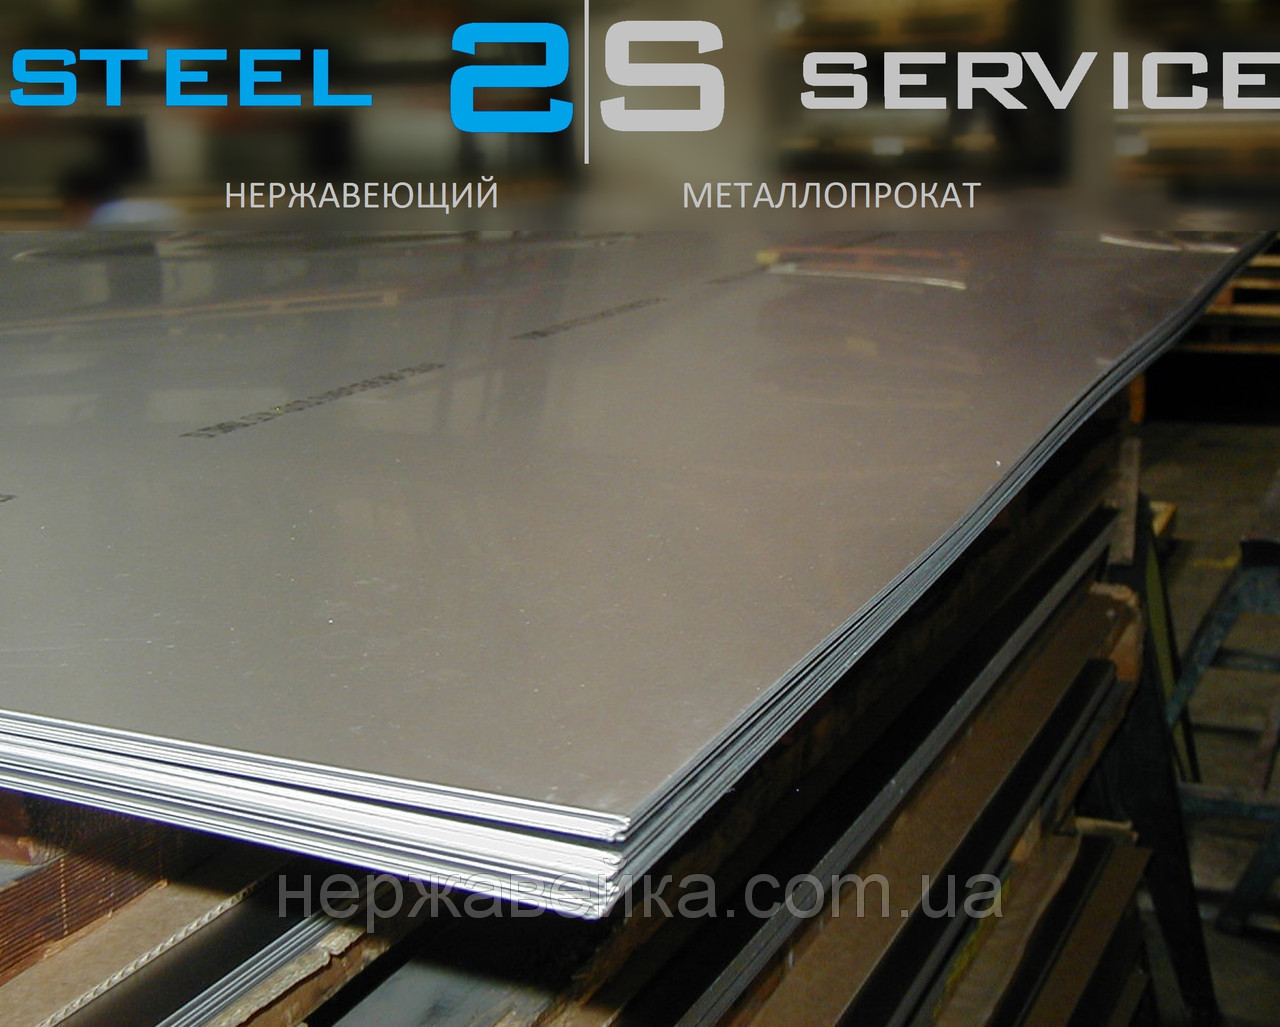 Листовая нержавейка 10х1250х2500мм AISI 430(12Х17) 2B - матовый, технический